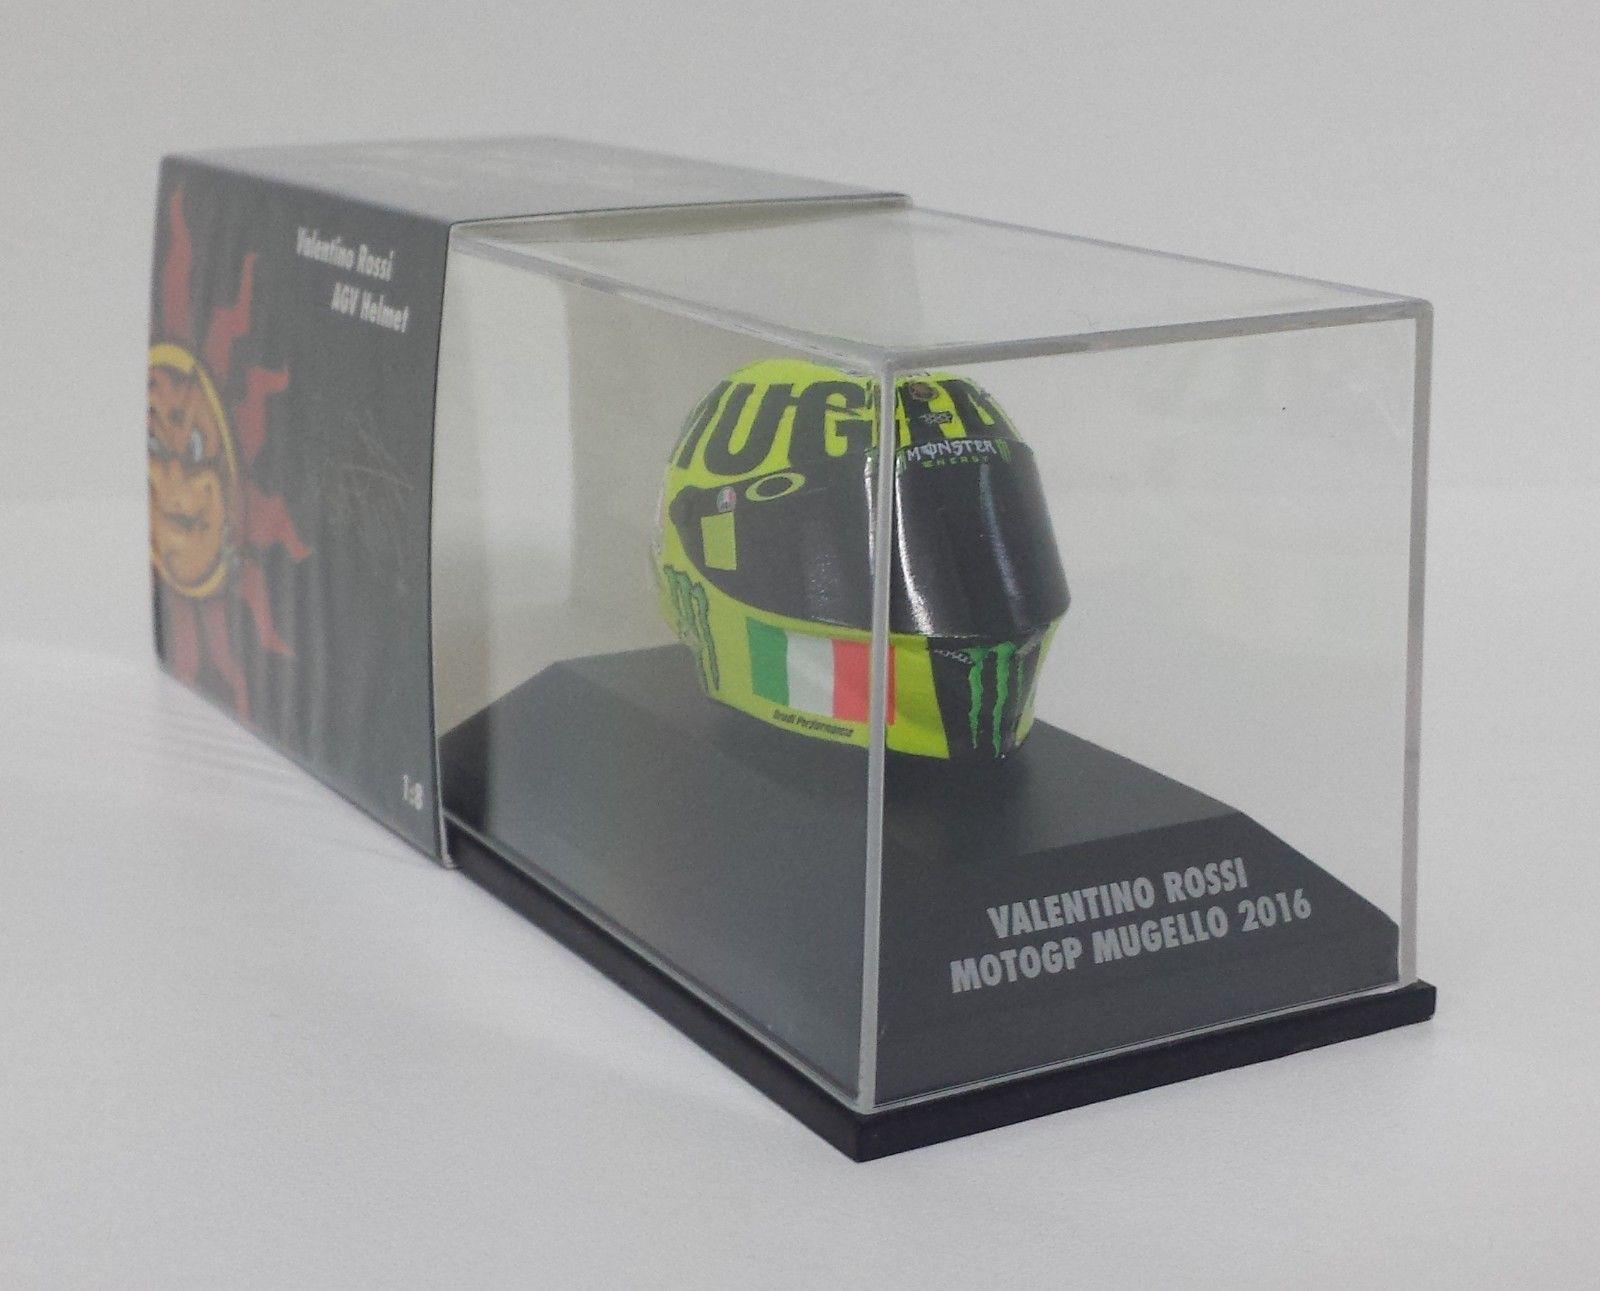 MINICHAMPS VALENTINO ROSSI MODELLINO AGV CASCO HELMET 1/8 GP MUGELLO 2016 MOTOGP NEW